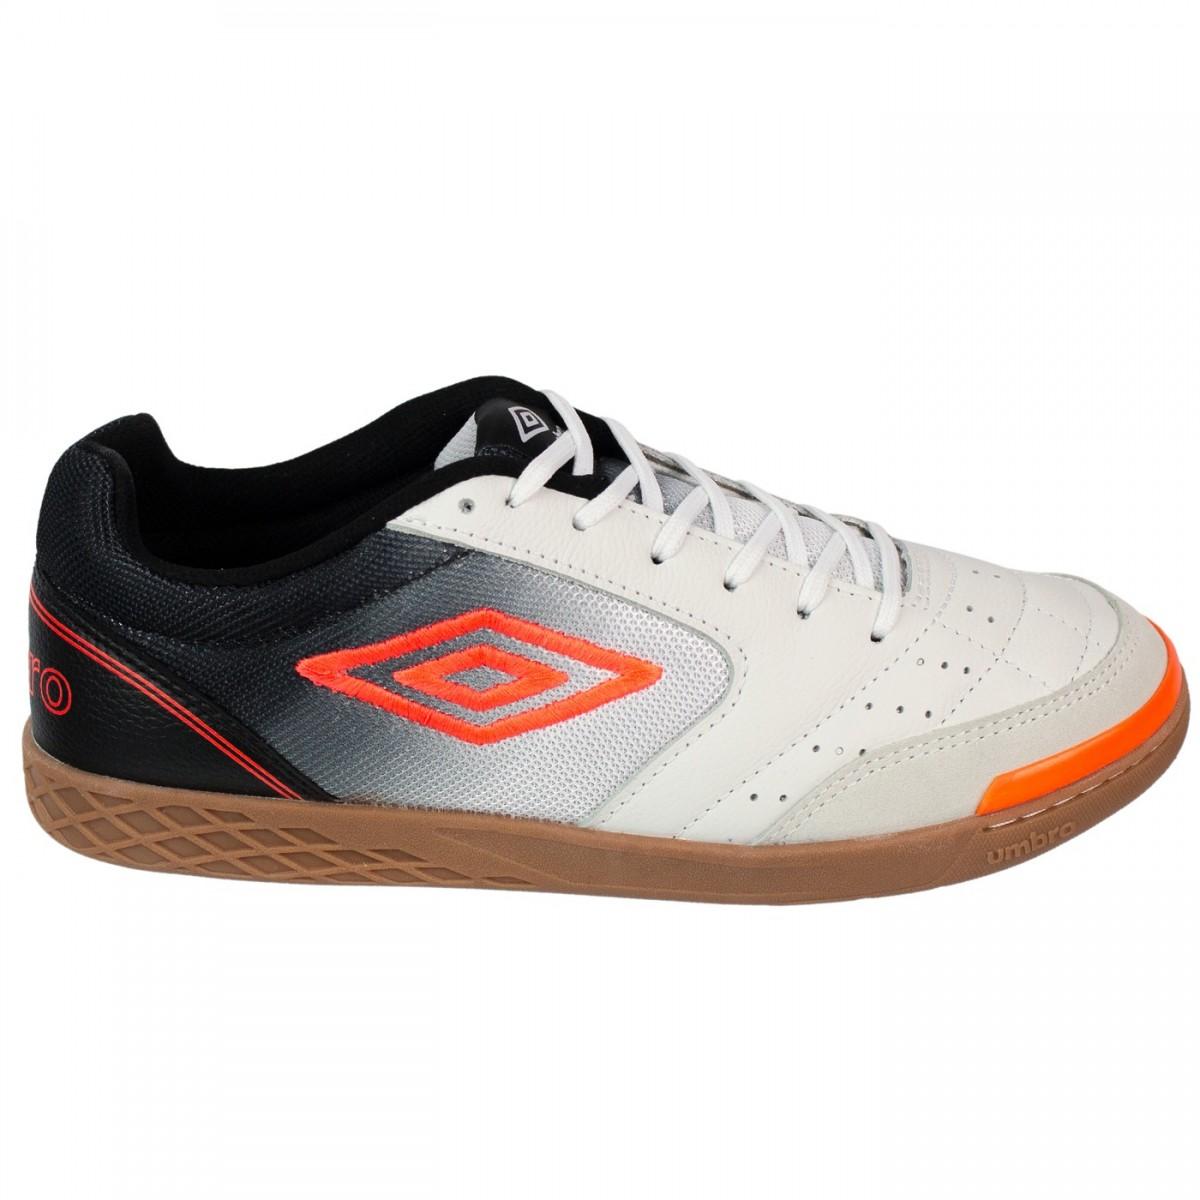 9203d660238 Bizz Store - Tênis Futsal Umbro Indoor Box Masculino Couro